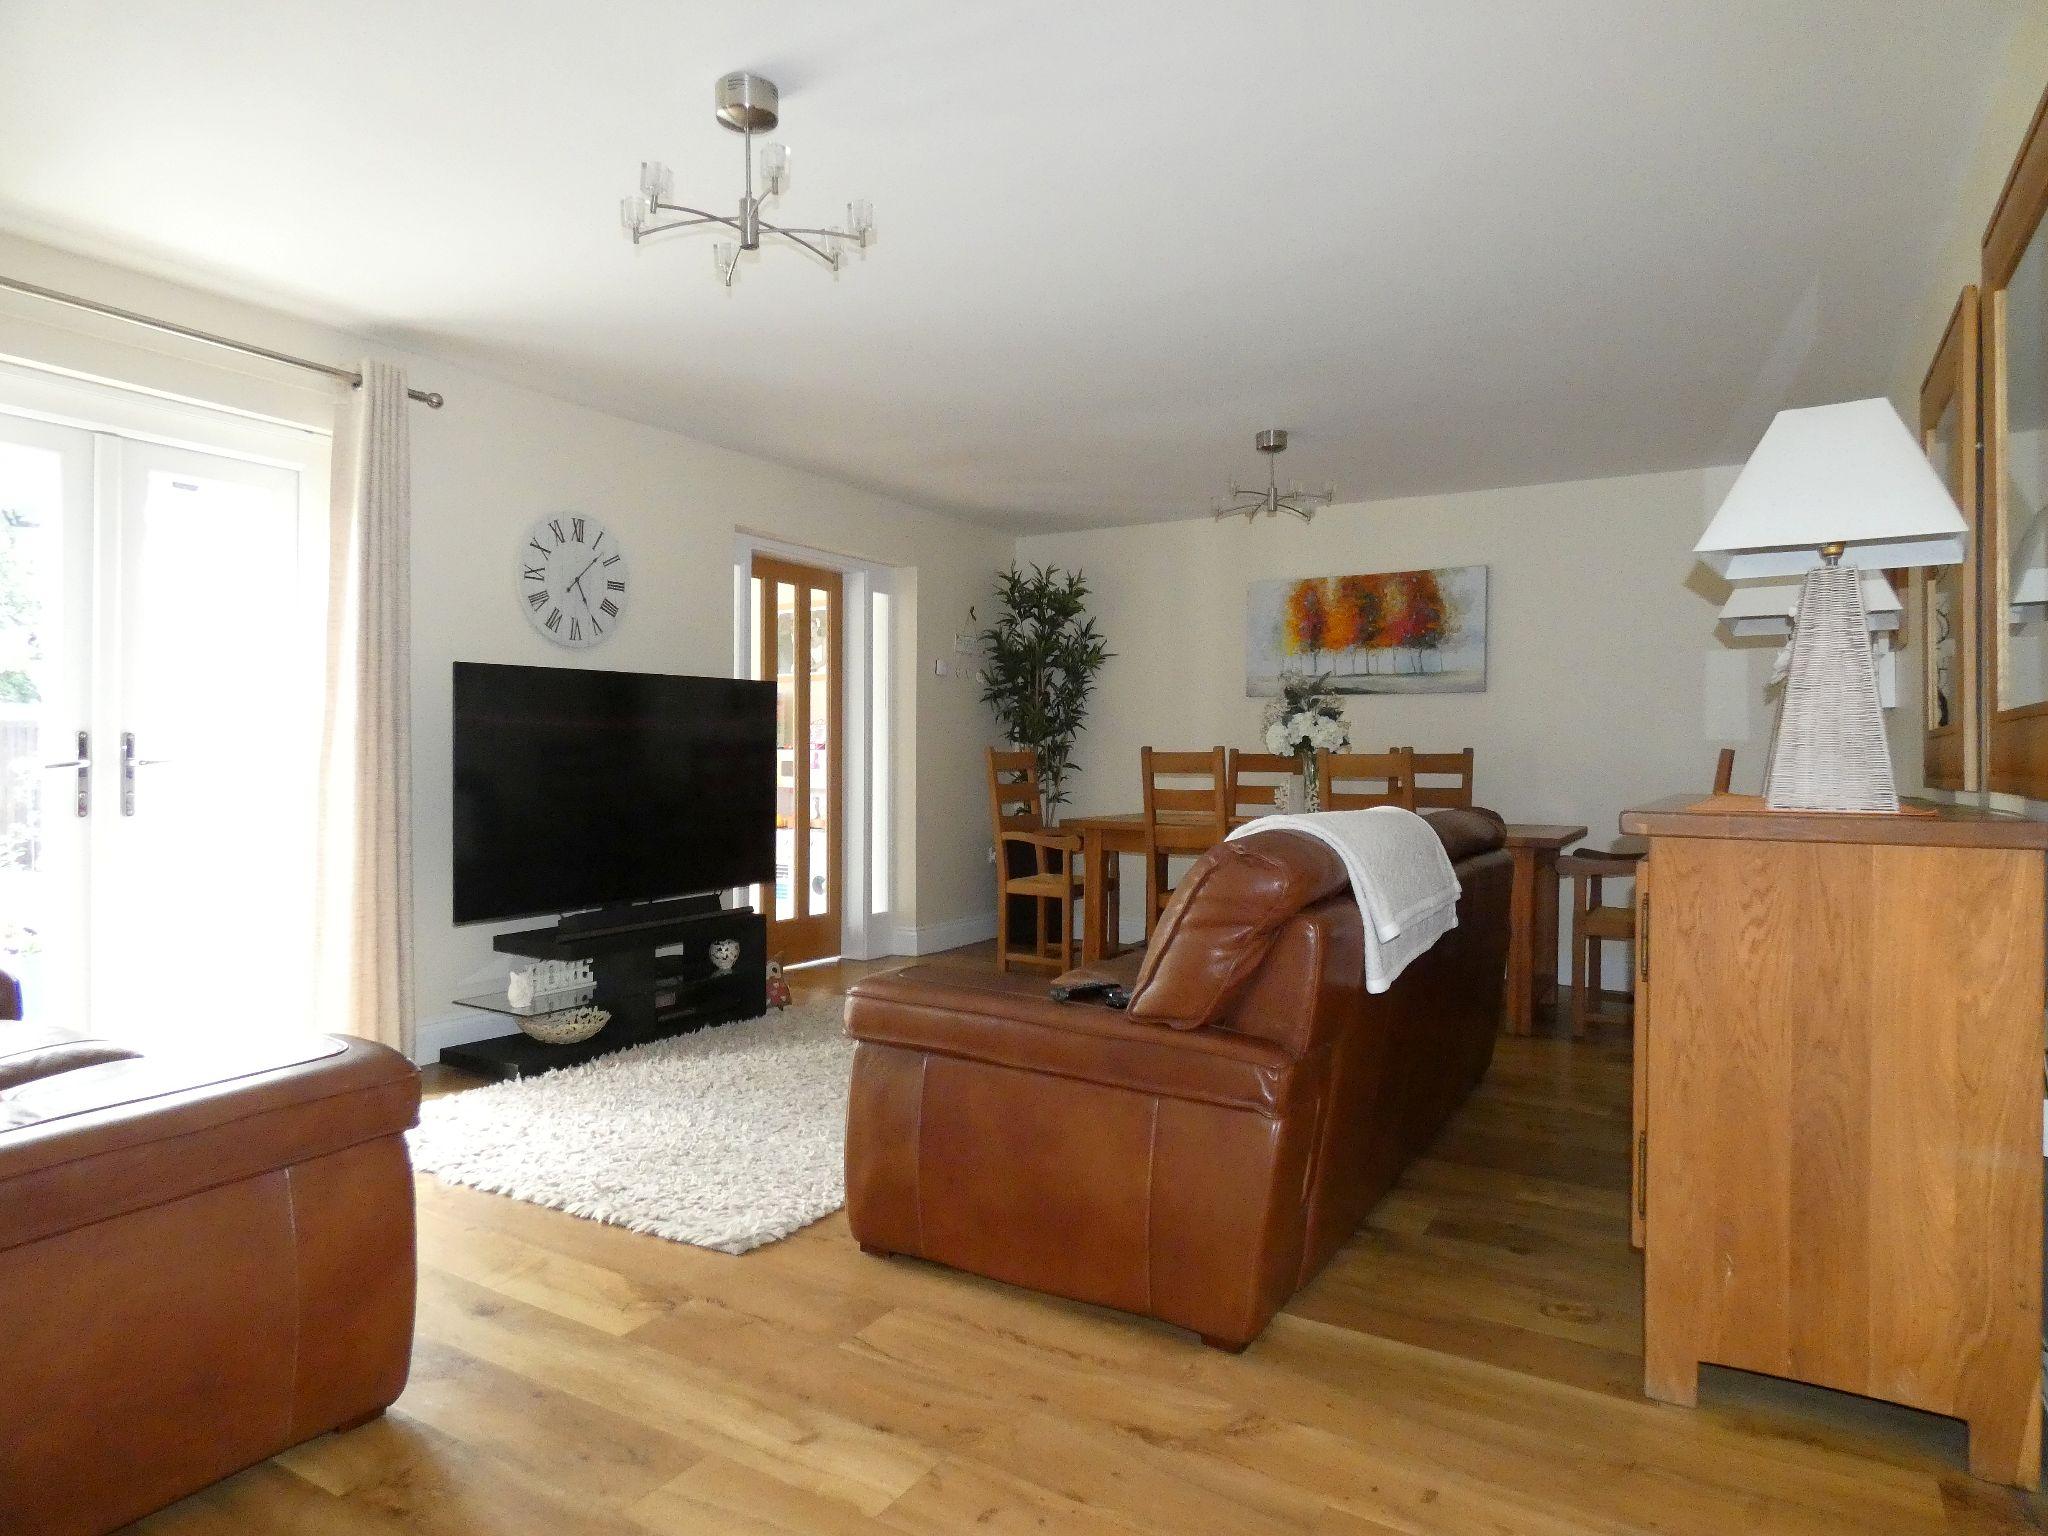 4 bedroom detached house Sale Agreed in Bishop Auckland - Kitchen Diner/Family Room.